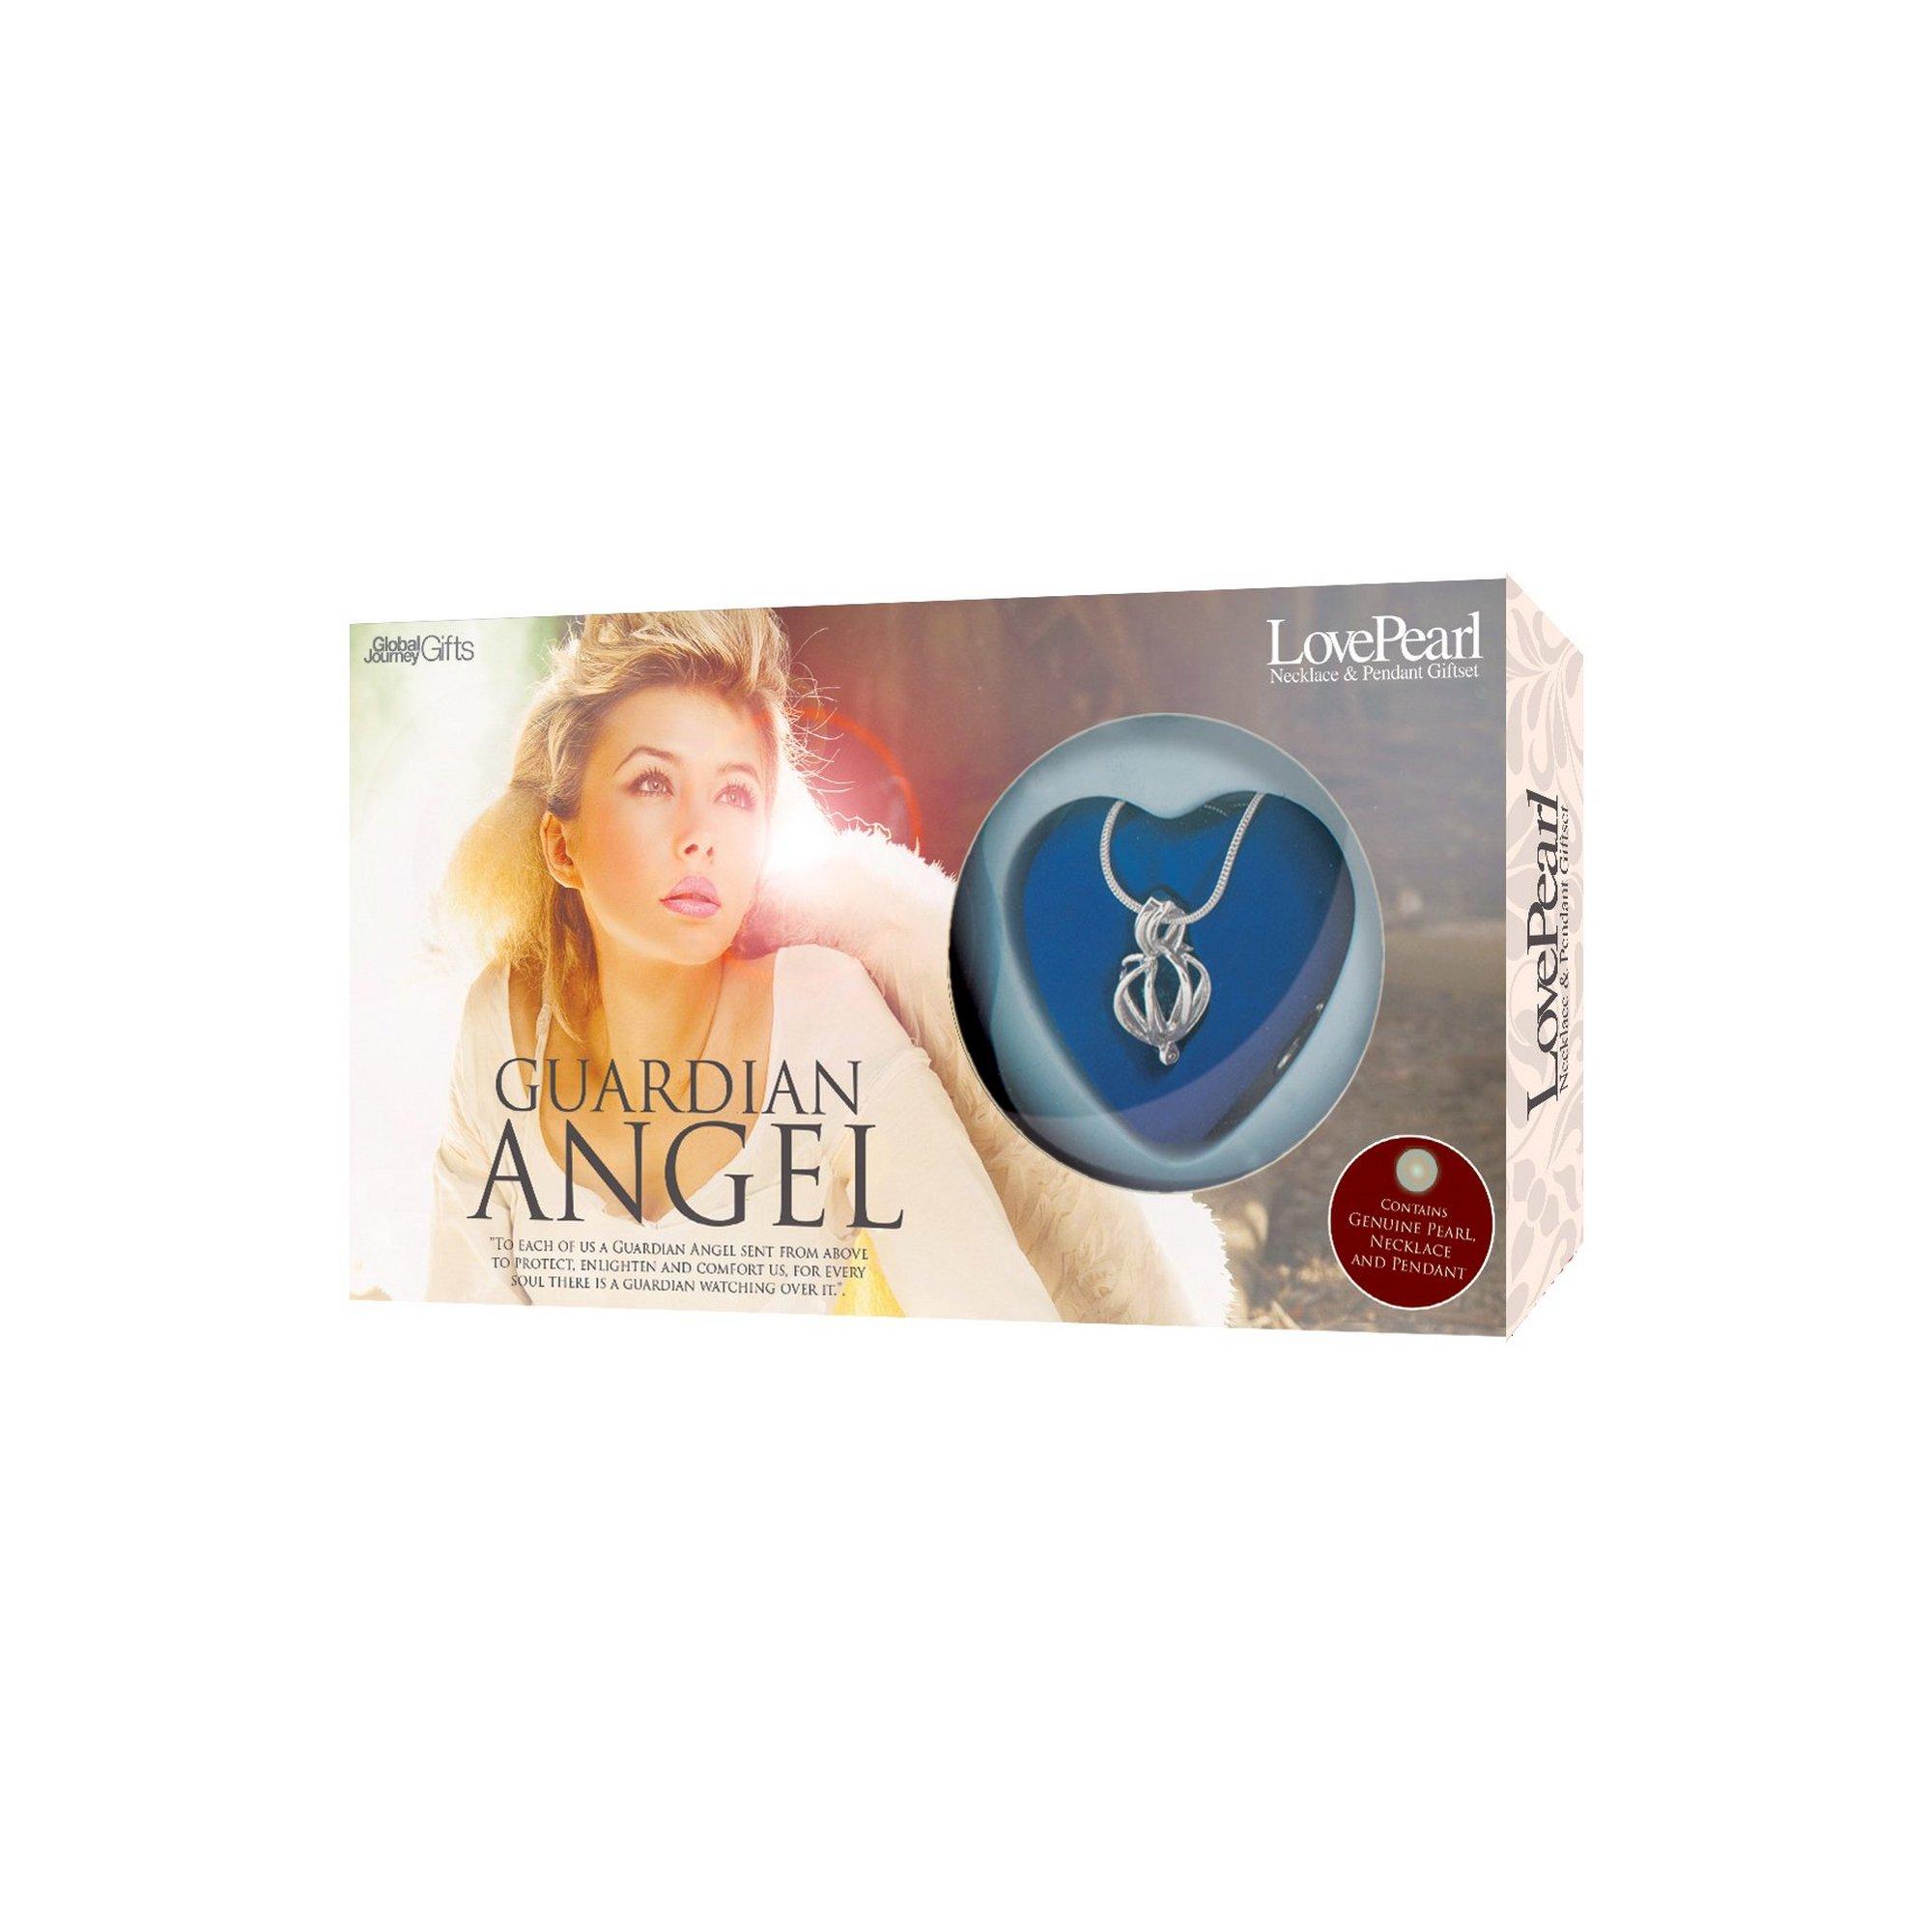 Image of Make a Wish Guardian Angel Pearl Pendant Gift Set